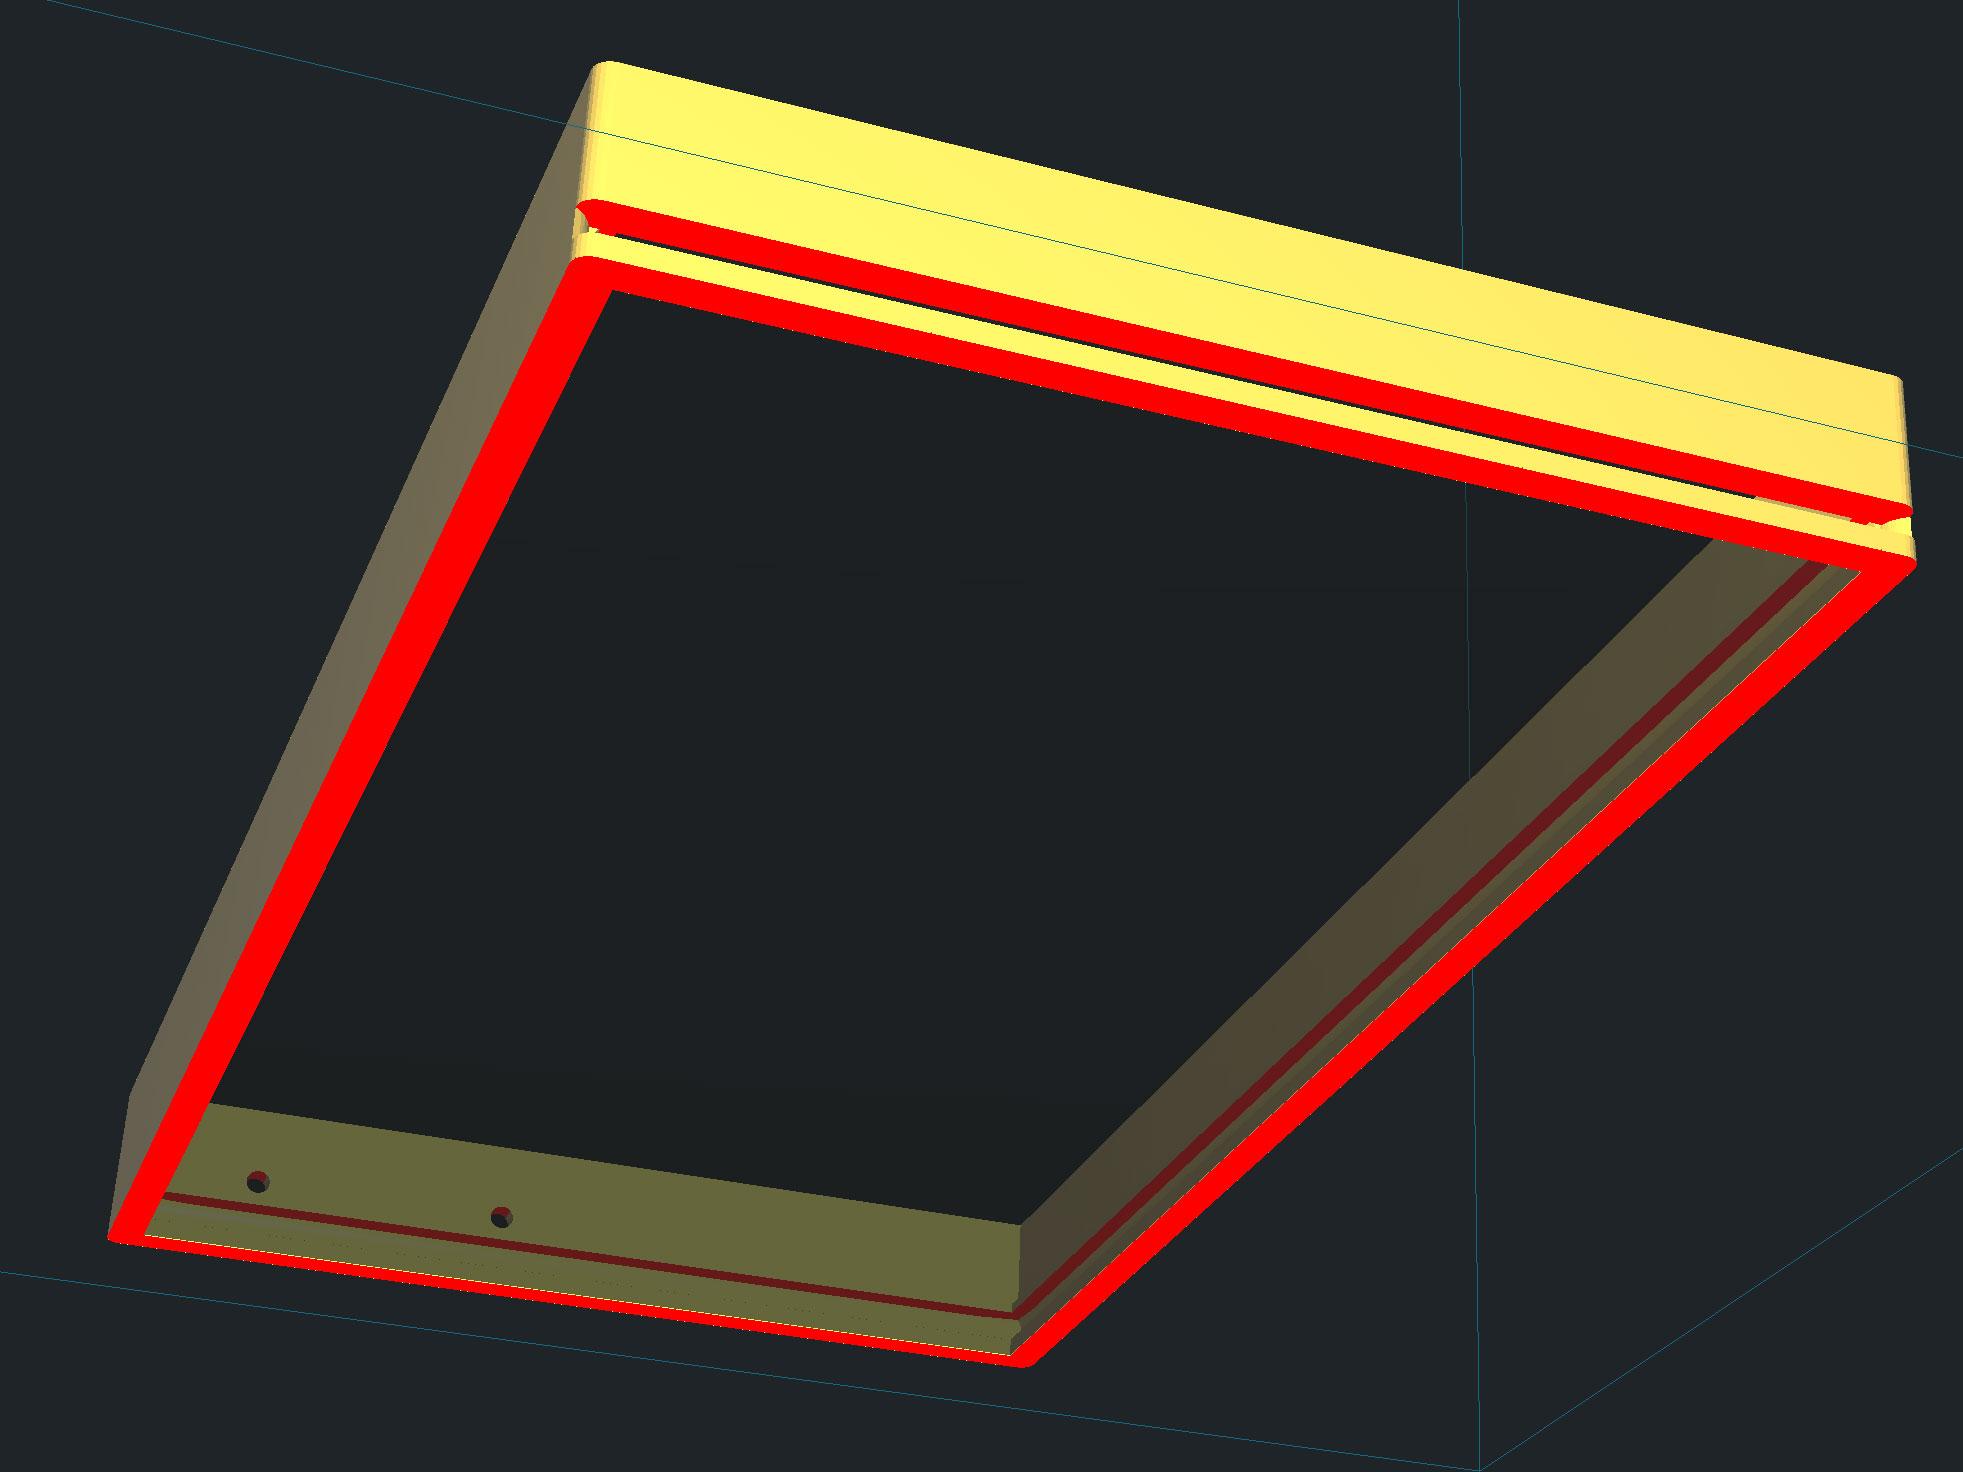 3d_printing_cura-frame-preview.jpg